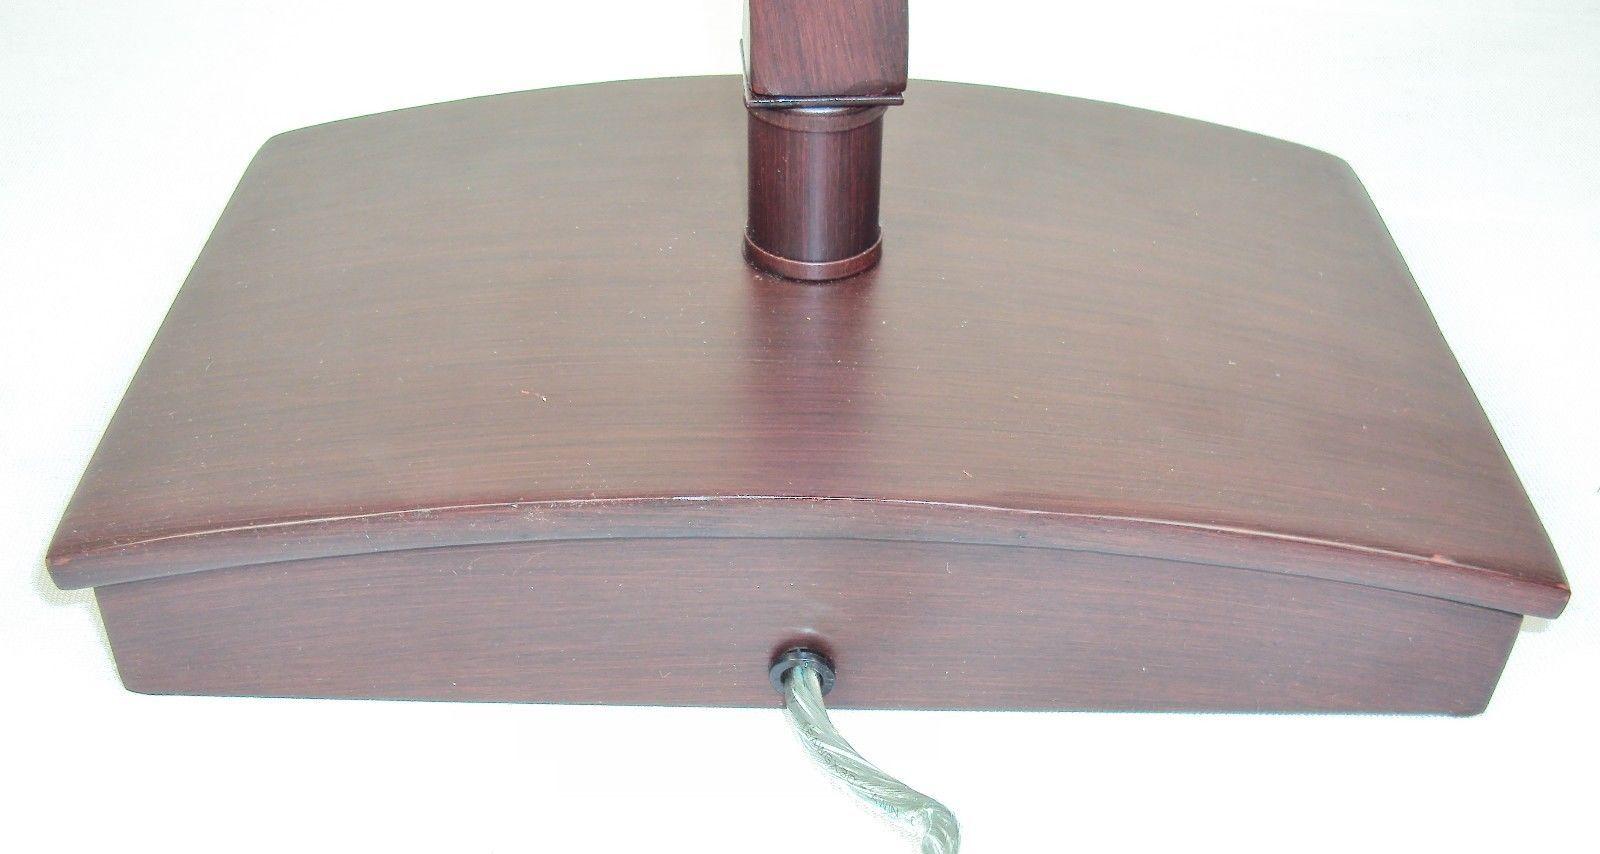 lamp twisted wood column w power outlet on base 2840640 lamps. Black Bedroom Furniture Sets. Home Design Ideas